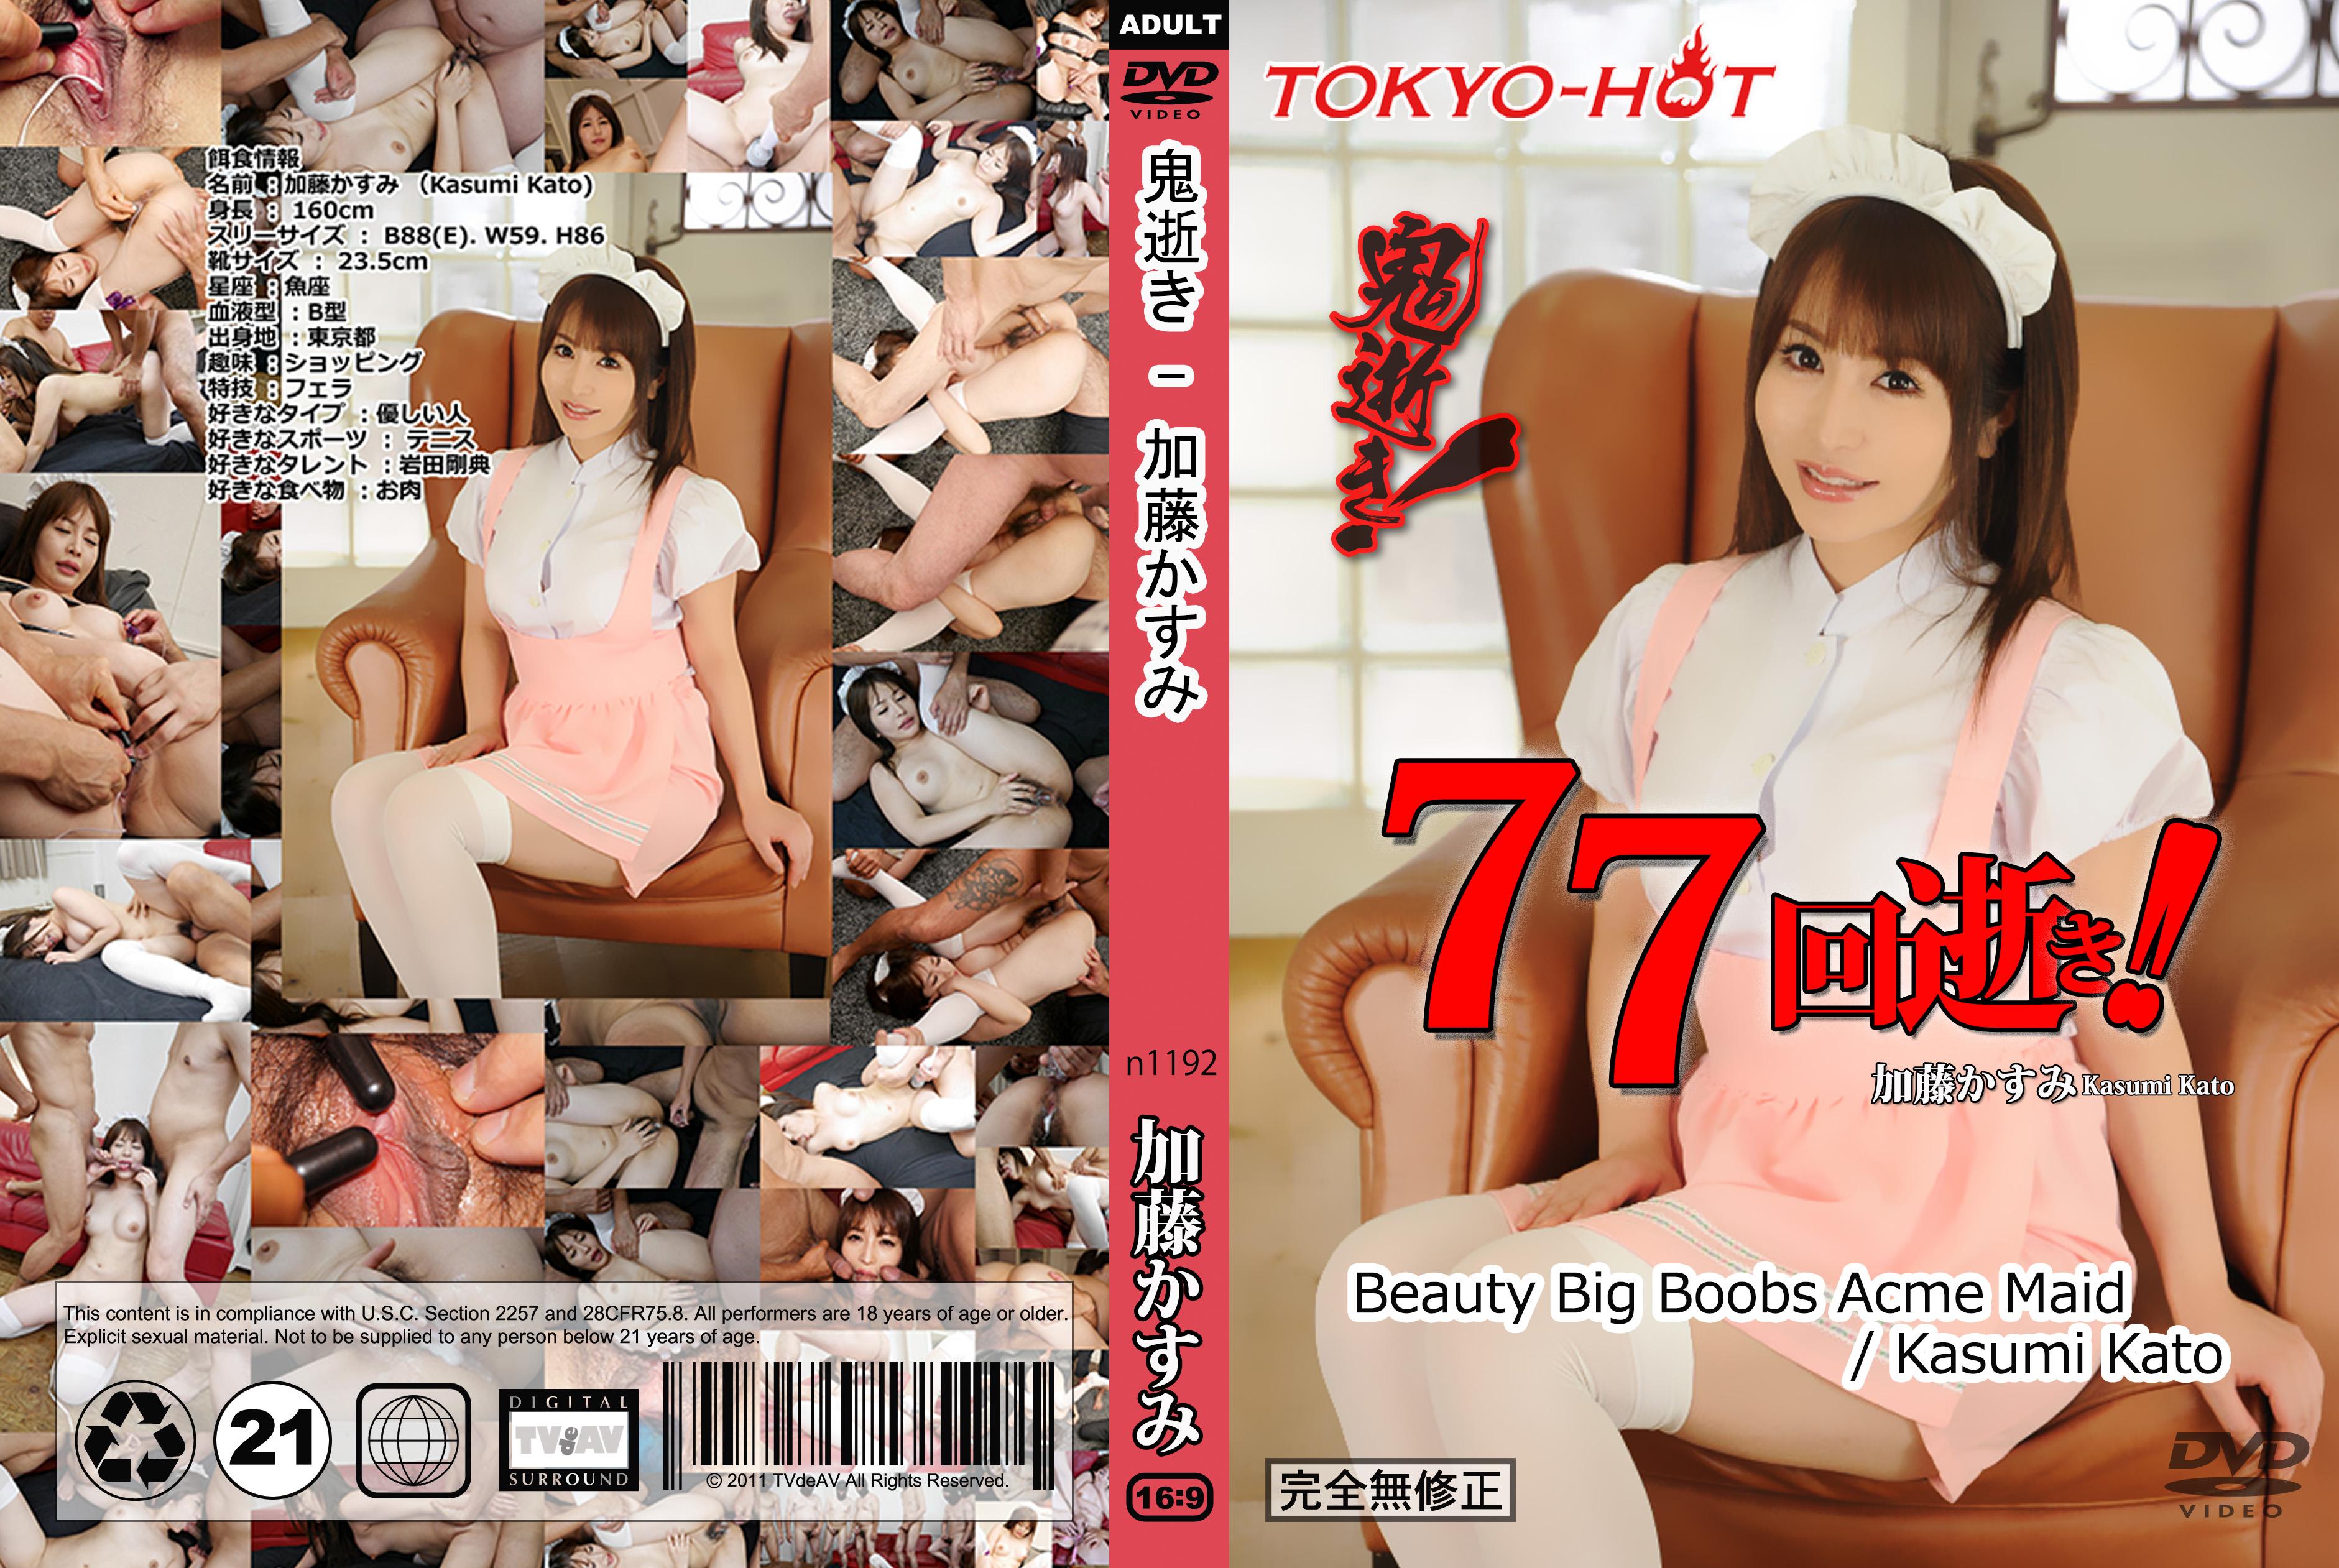 Tokyo Hot n1192 鬼逝き~加藤かすみ